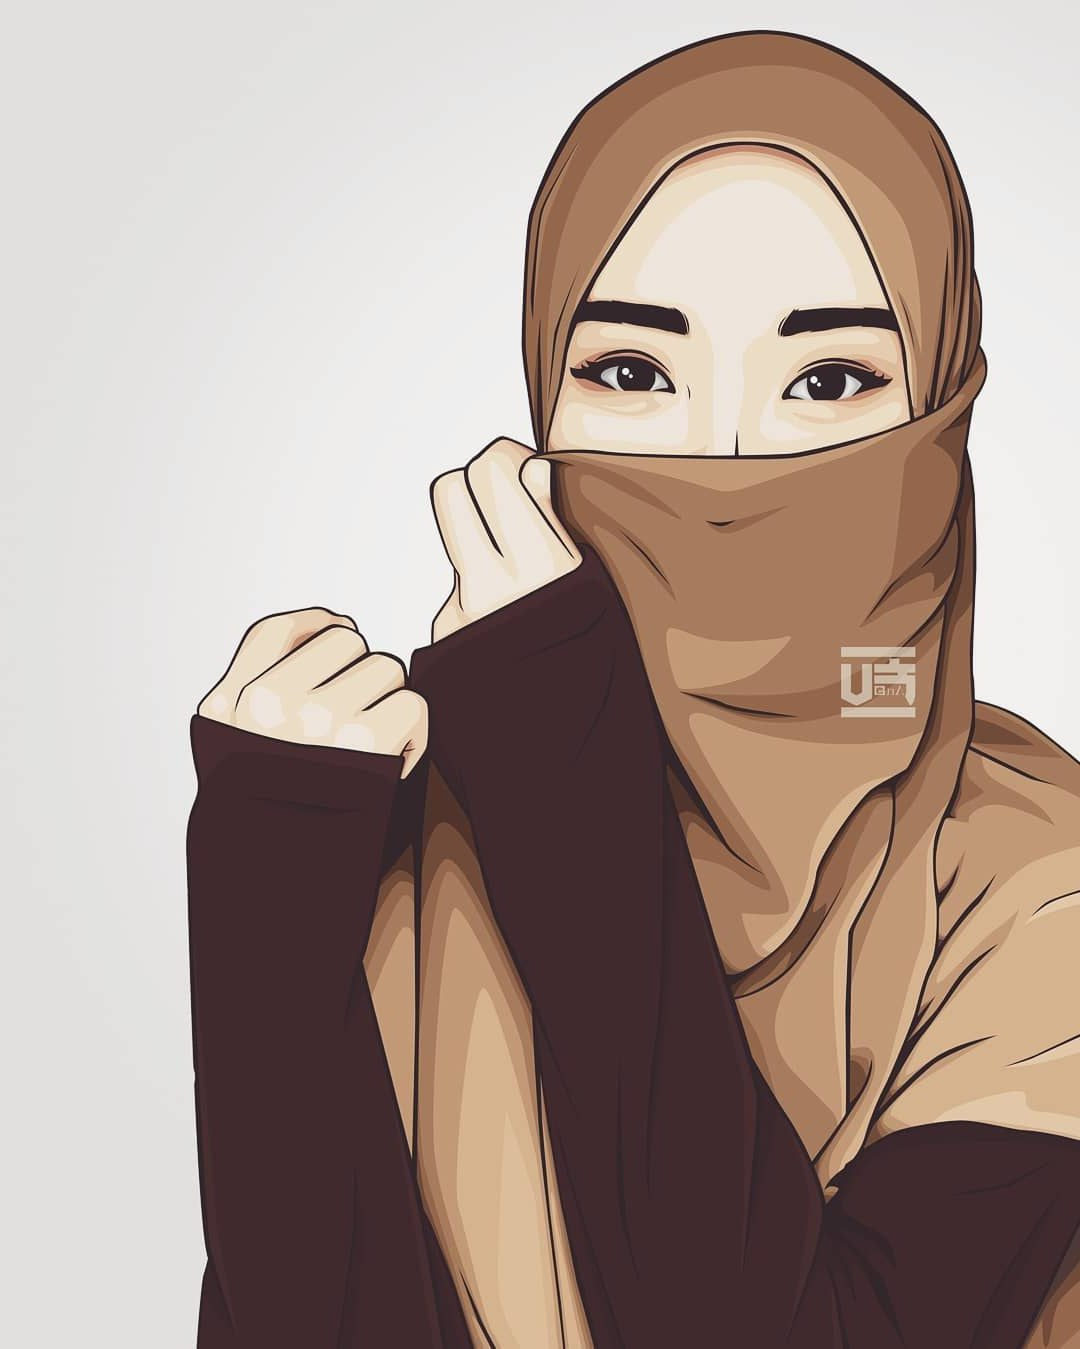 Design Muslimah Bercadar Cantik Kartun 8ydm 1000 Gambar Kartun Muslimah Cantik Bercadar Kacamata El